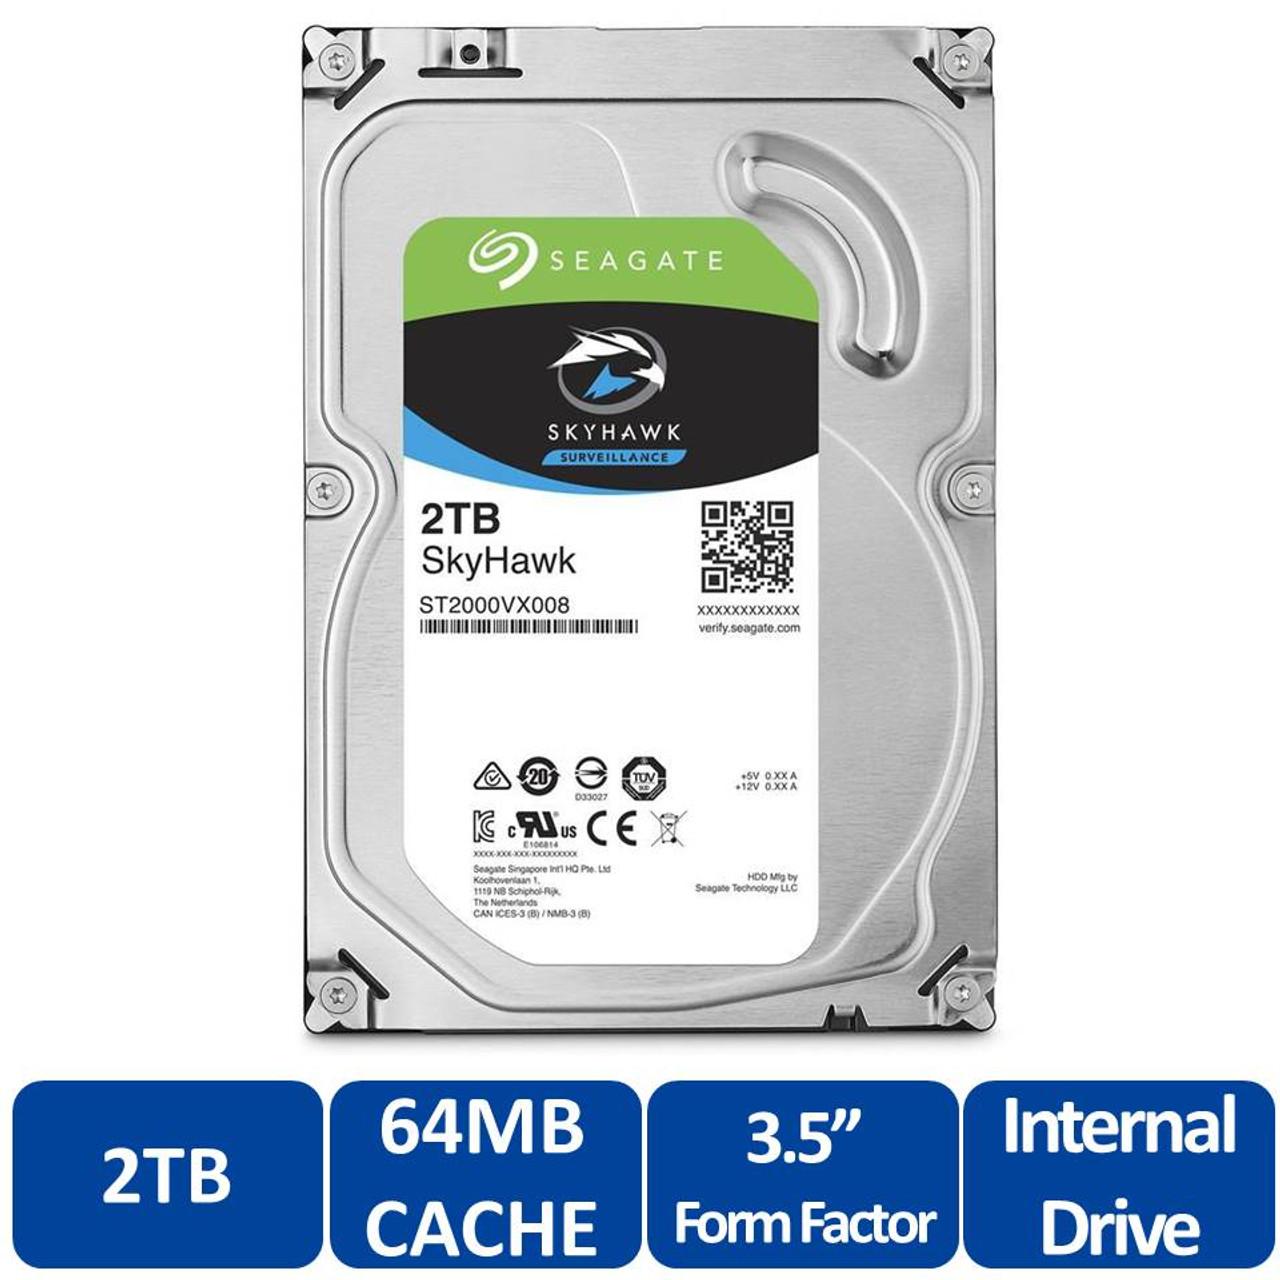 "ST2000VX008 SATA 6Gb//s 64MB Cache 3.5/"" Seagate SkyHawk 2TB Surveillance HD"